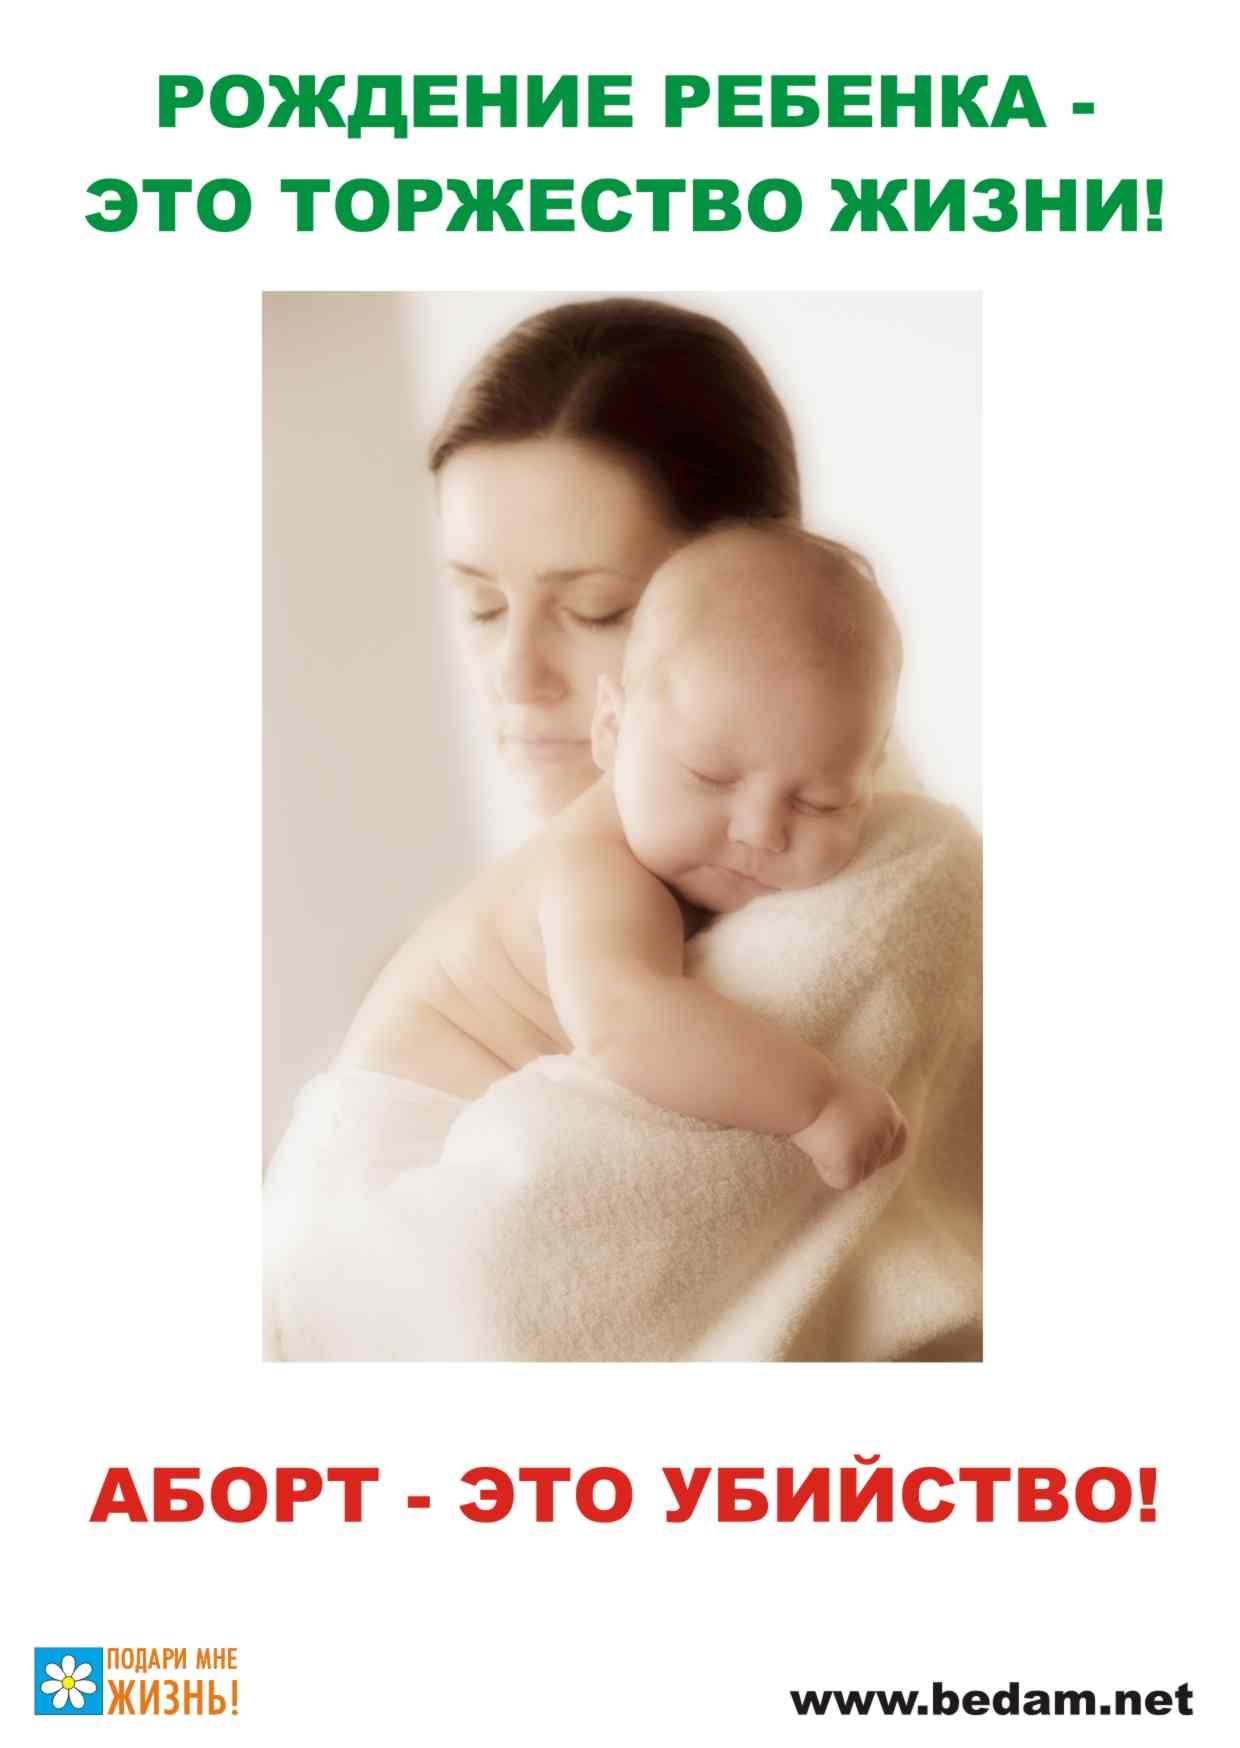 seks-posle-vakuumnogo-aborta